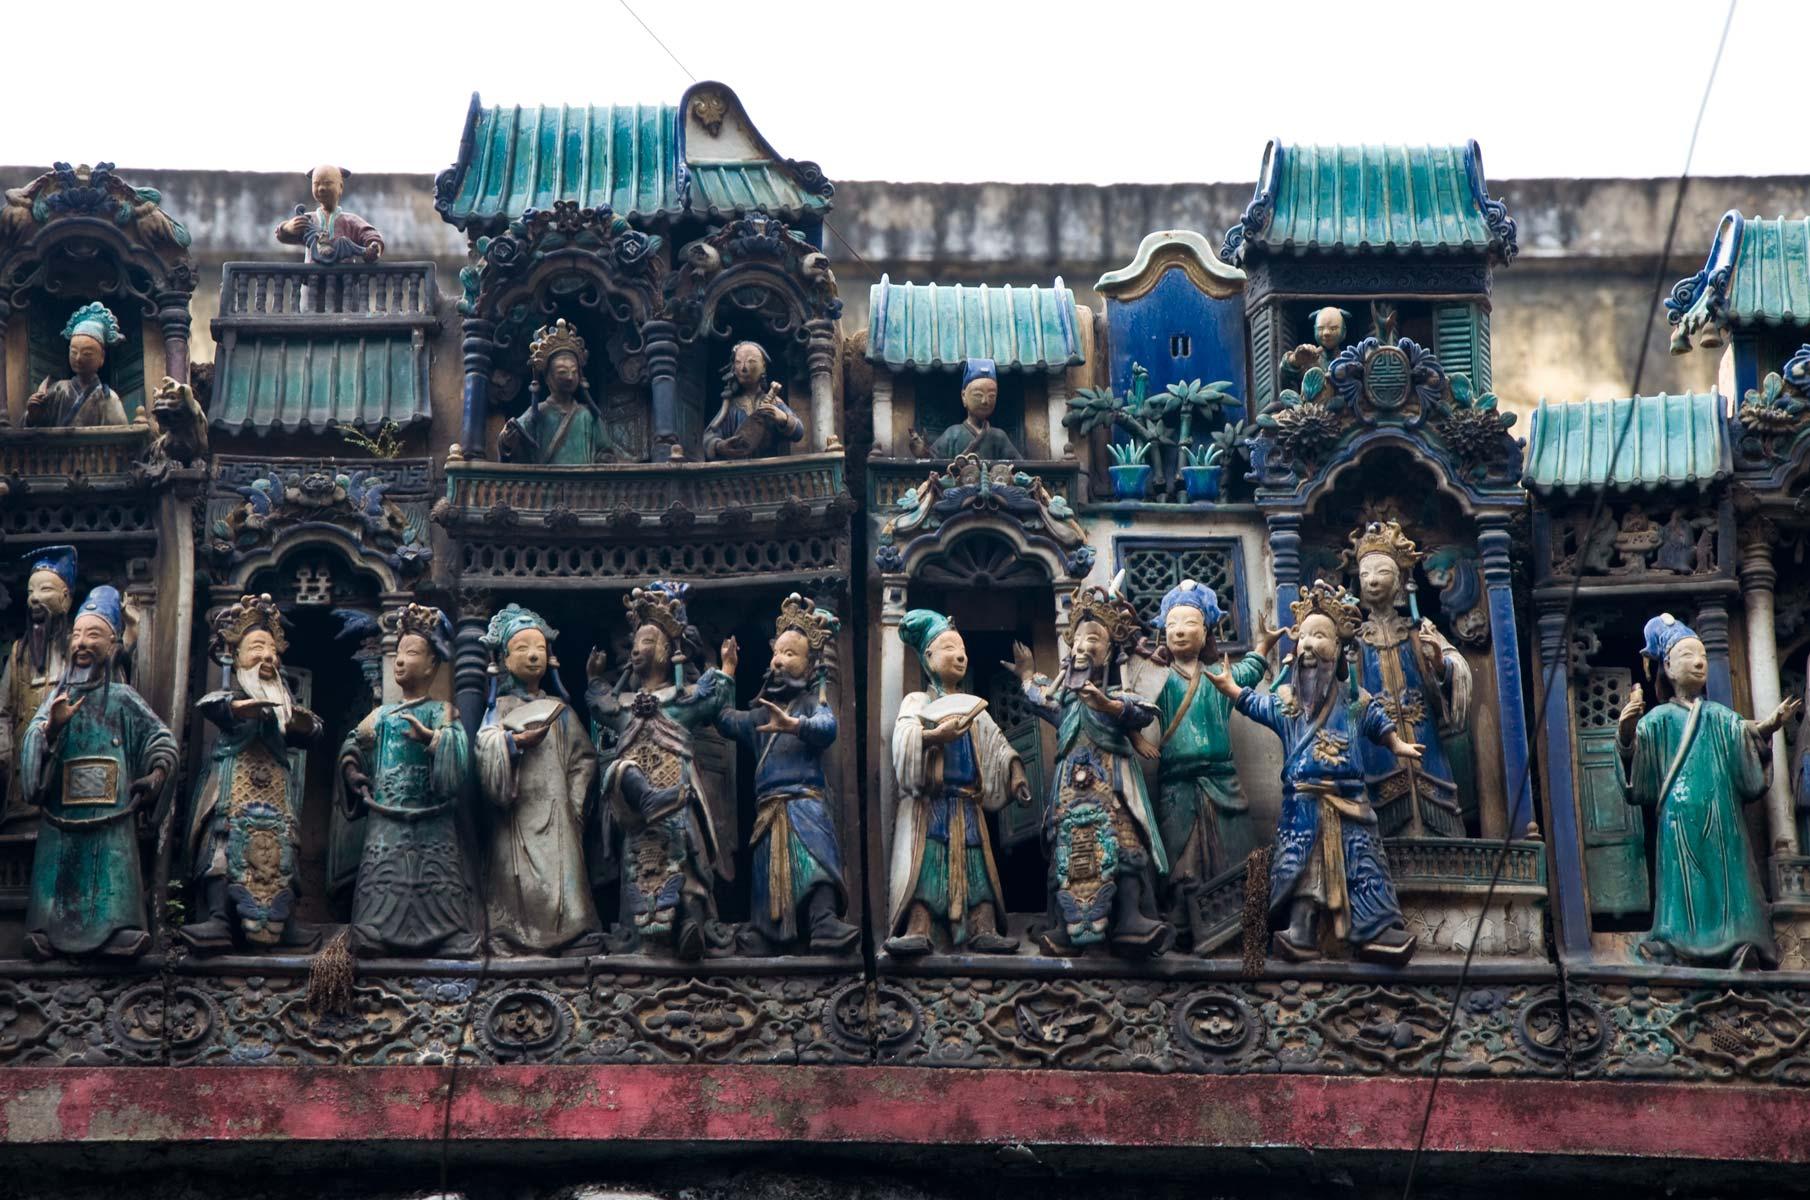 Thien Hau Tempel in Saigon (Ho-Chi-Minh Stadt), Vietnam